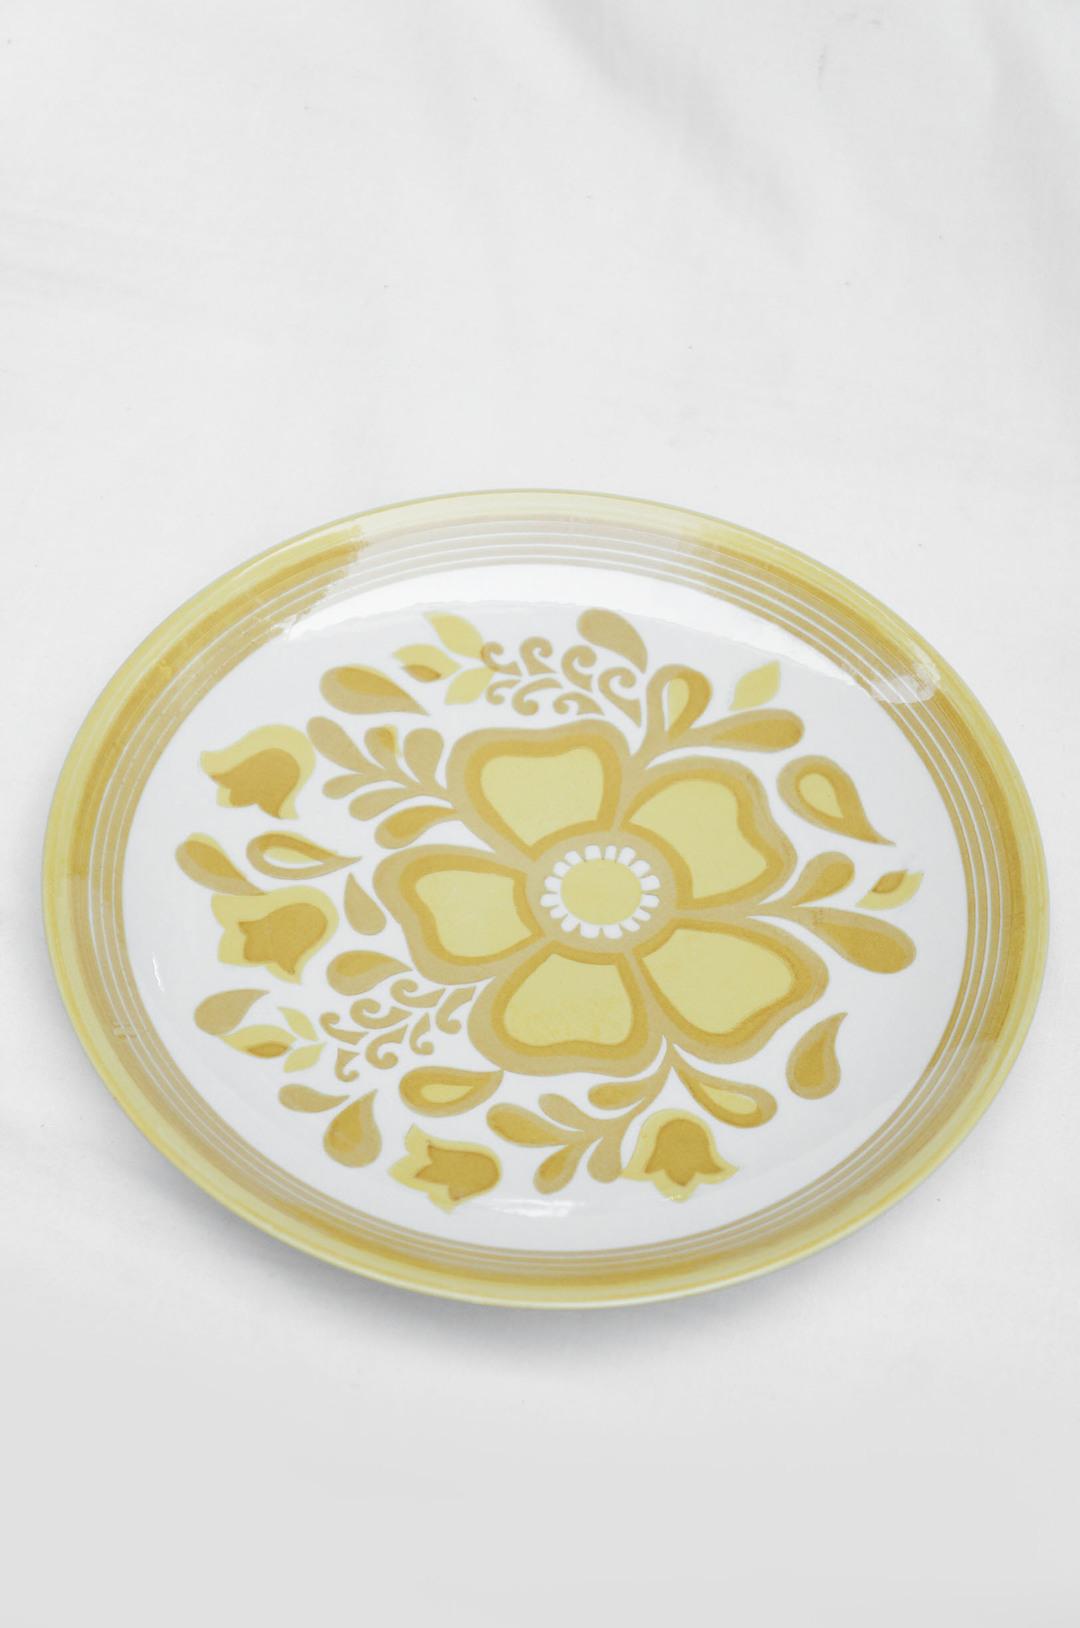 US Vintage Royal China Damsel Dinner Plate/アメリカ ヴィンテージ ロイヤルチャイナ ダムセル ディナープレート 食器 レトロ 3